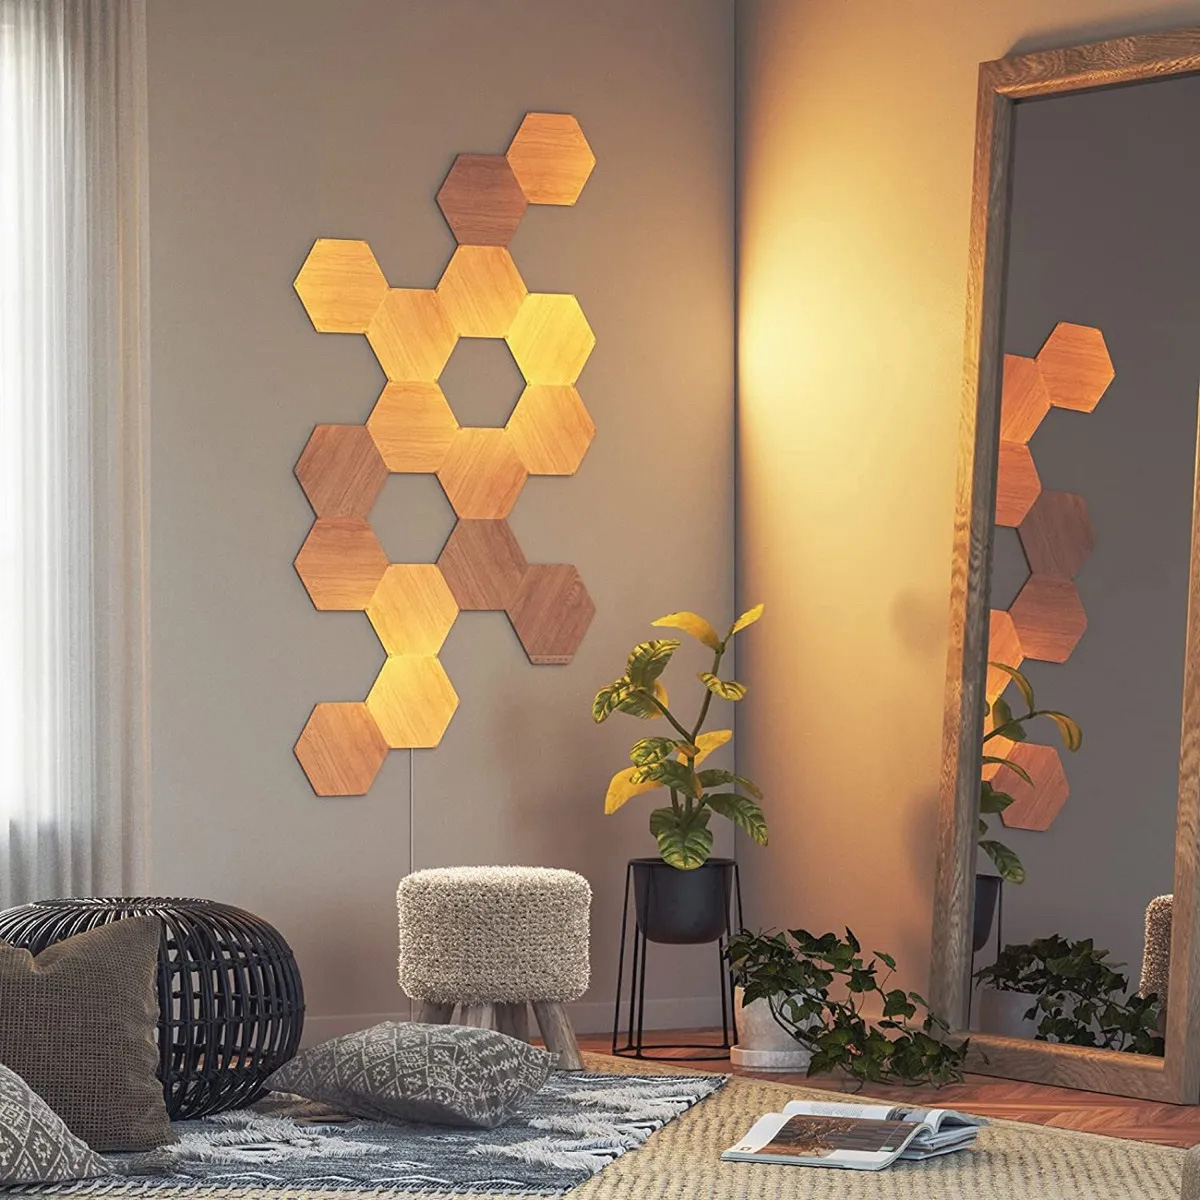 Nanoleaf Hexagons Legno - Lifestyle 2